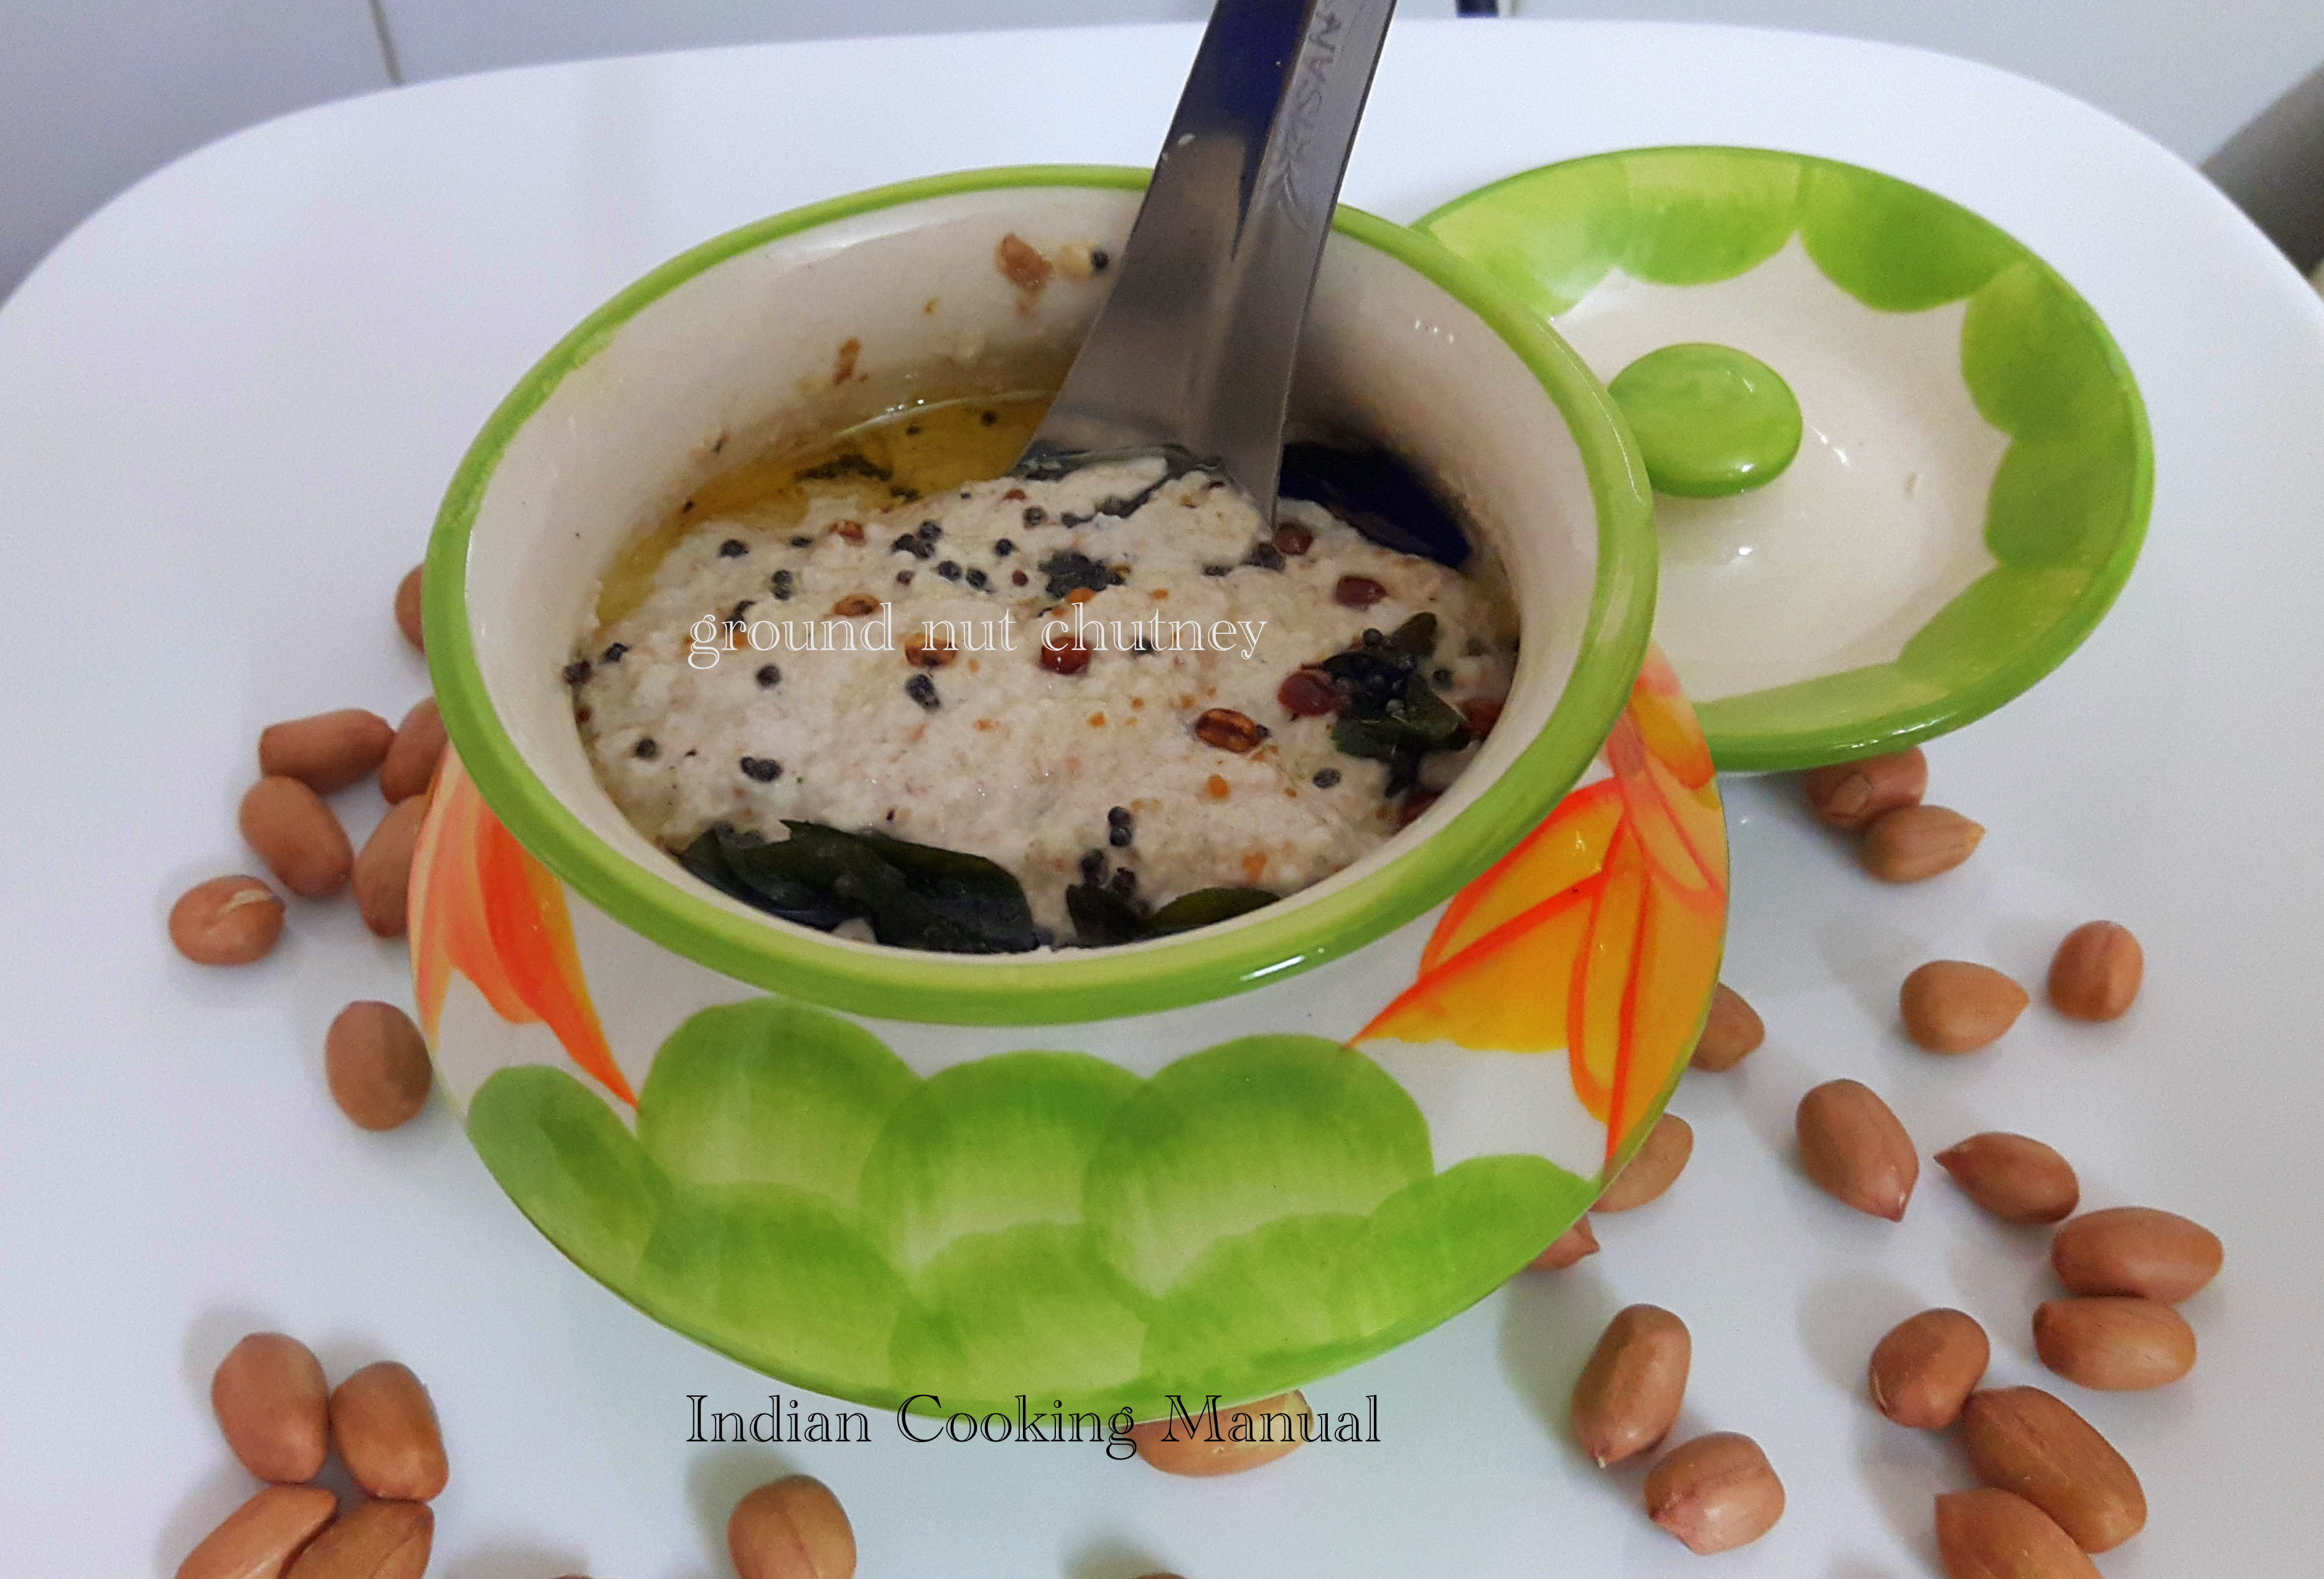 Moongphali ki Chutney (raw peanut dip)